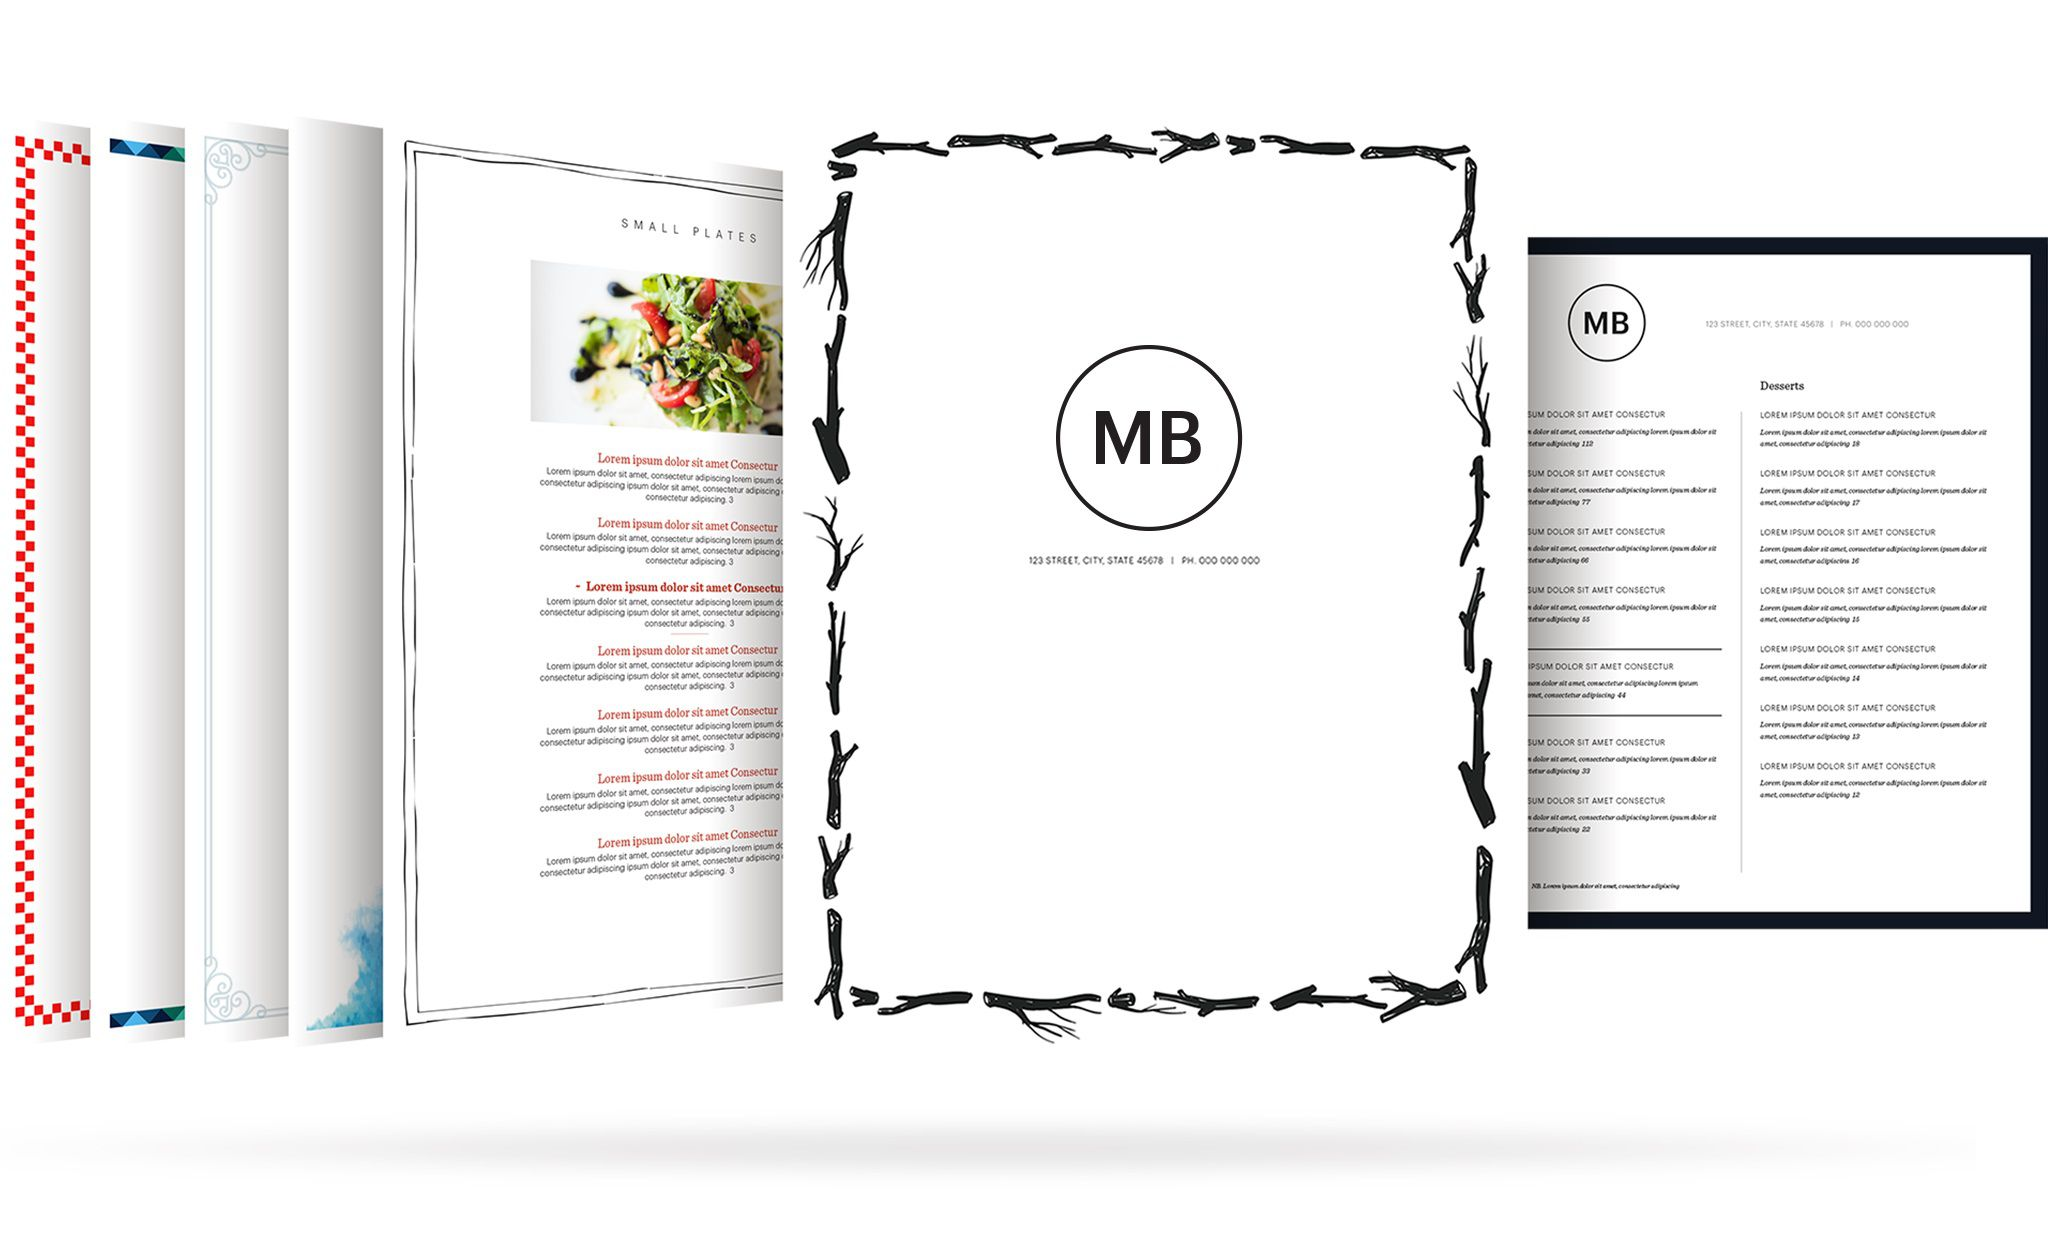 006 Incredible Restaurant Menu Template Free High Def  Card Download Indesign WordFull